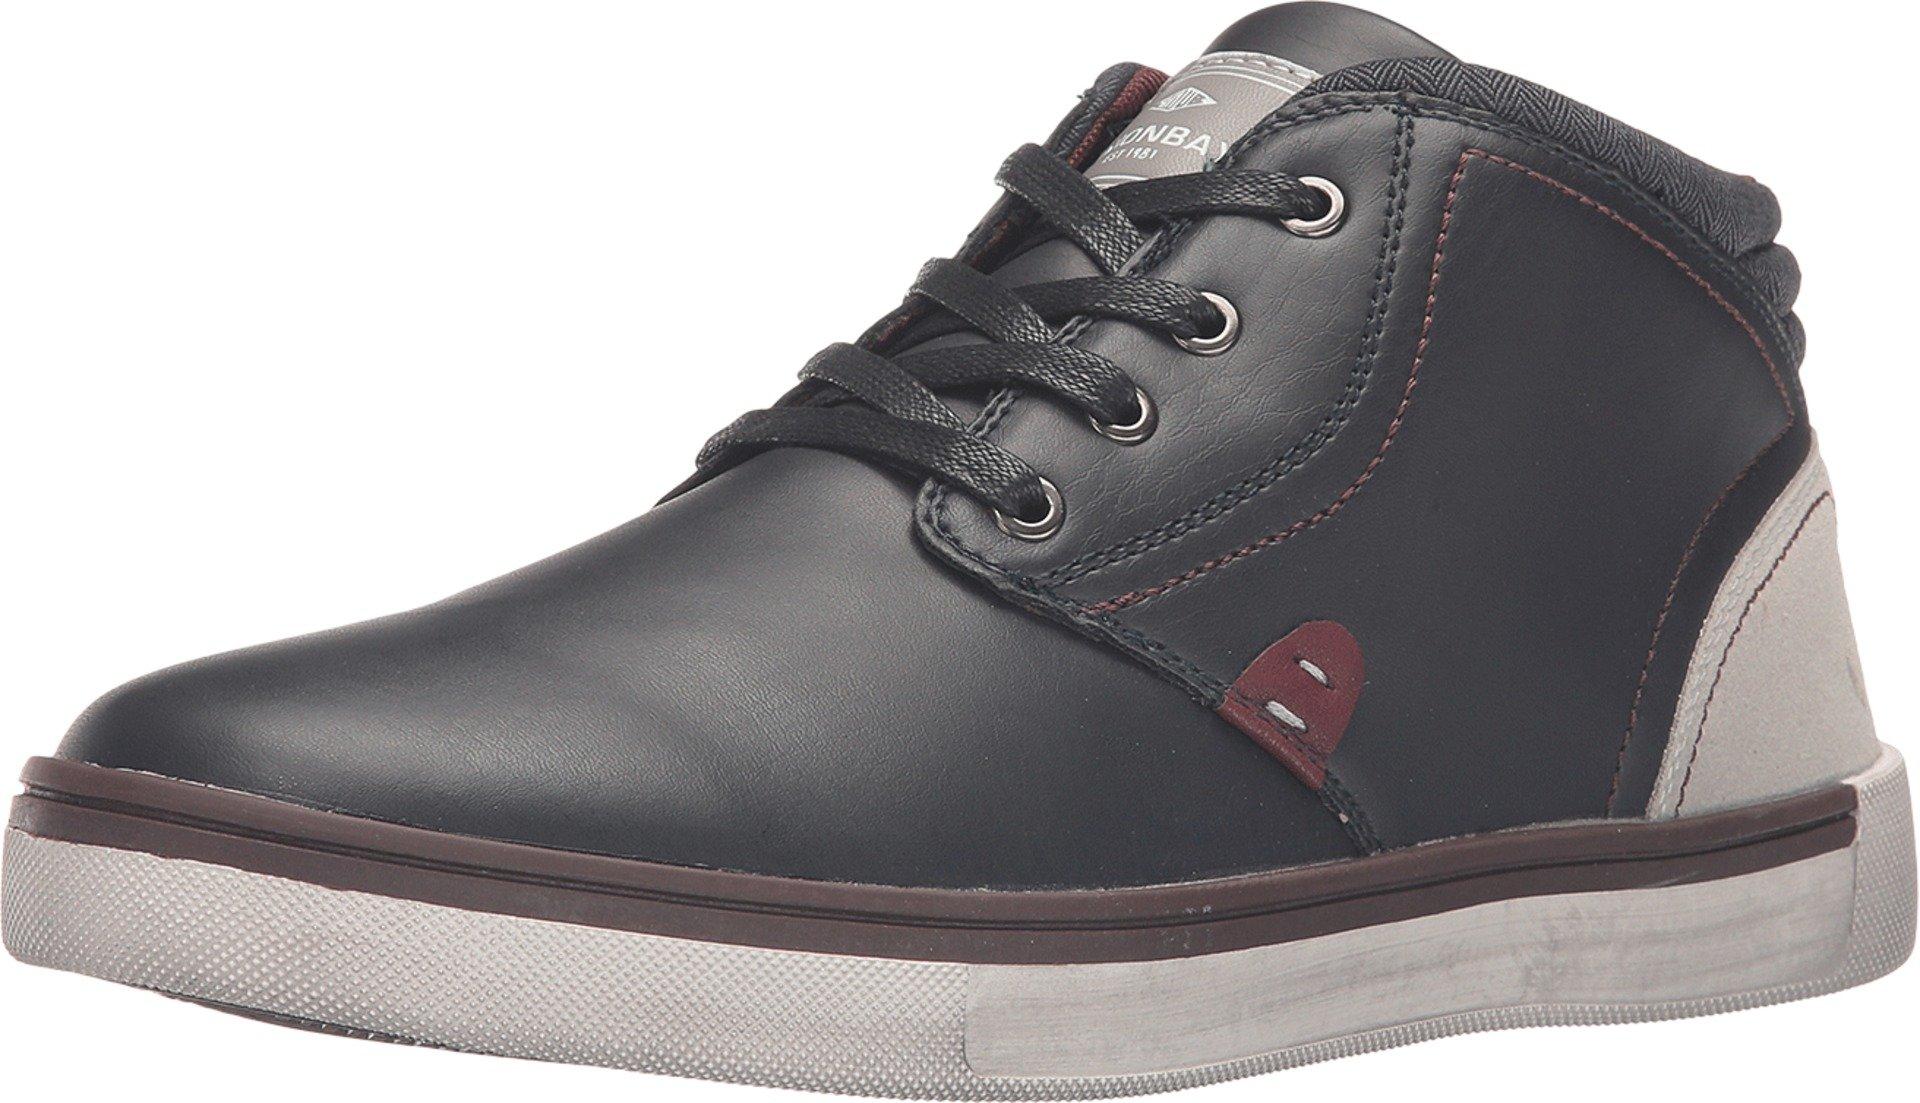 UNIONBAY Men's Mabton Chukka Boot Navy Sneaker 10 M